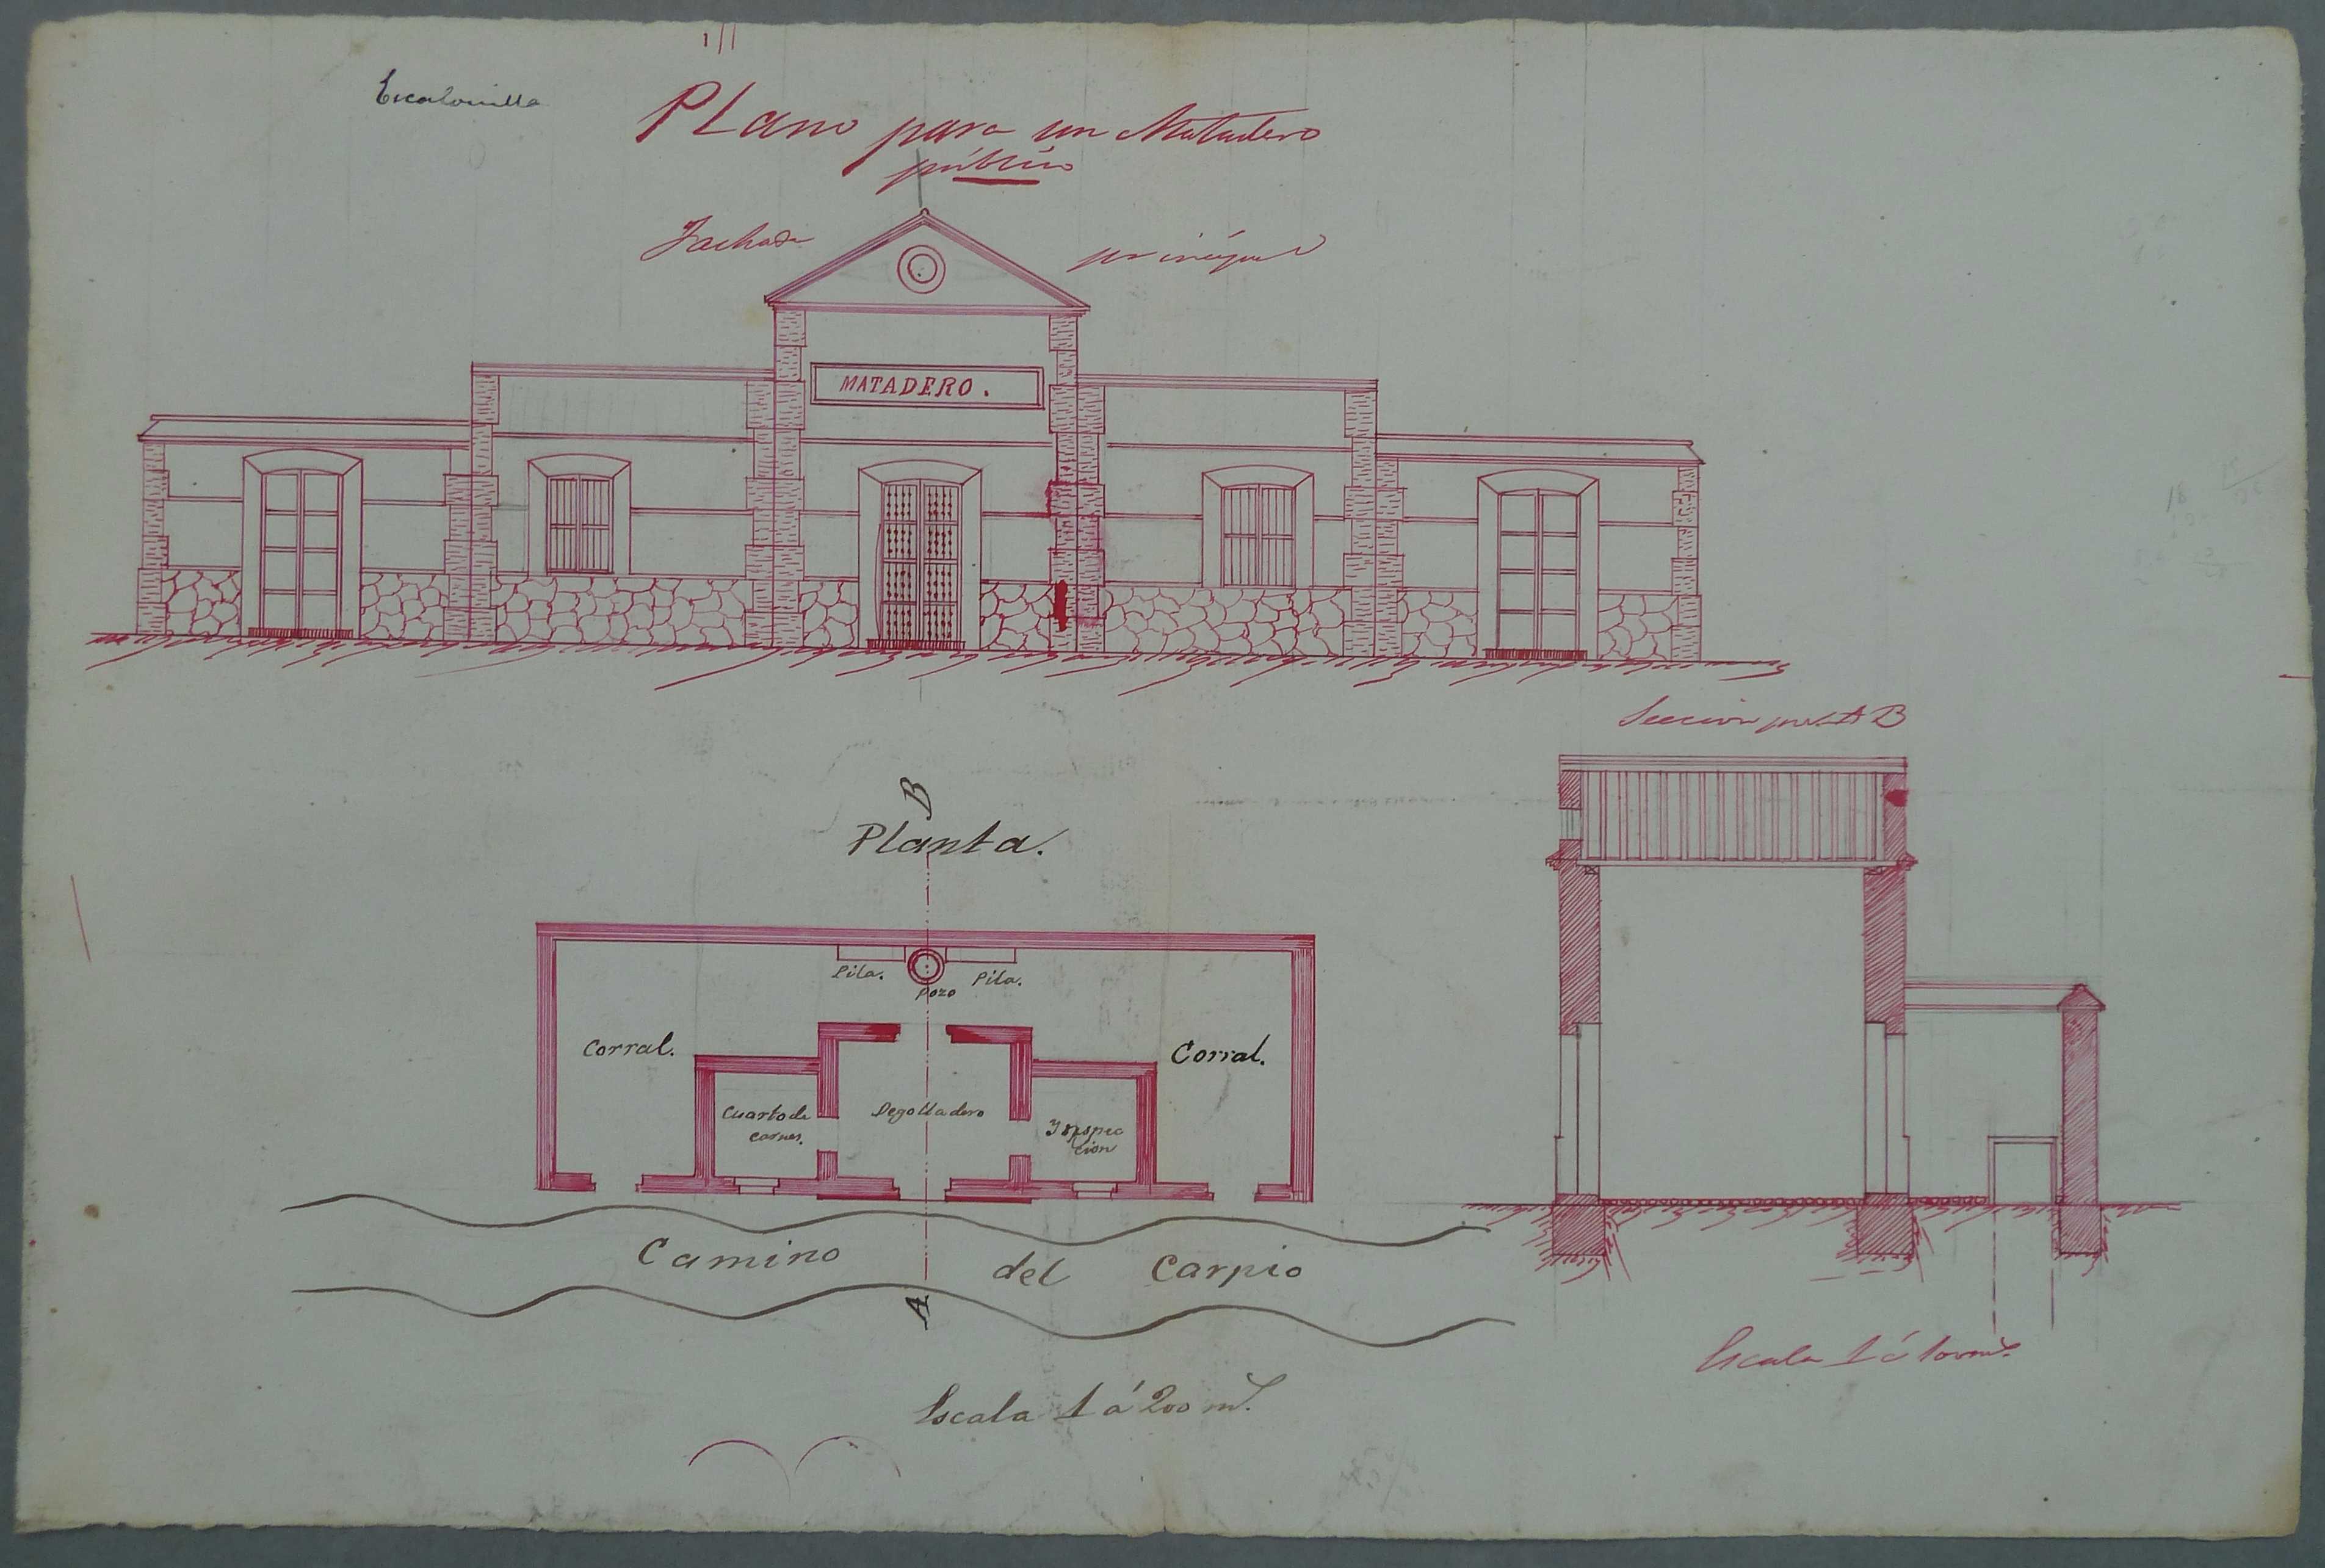 Escalonilla. Plano edificio matadero público, 1884